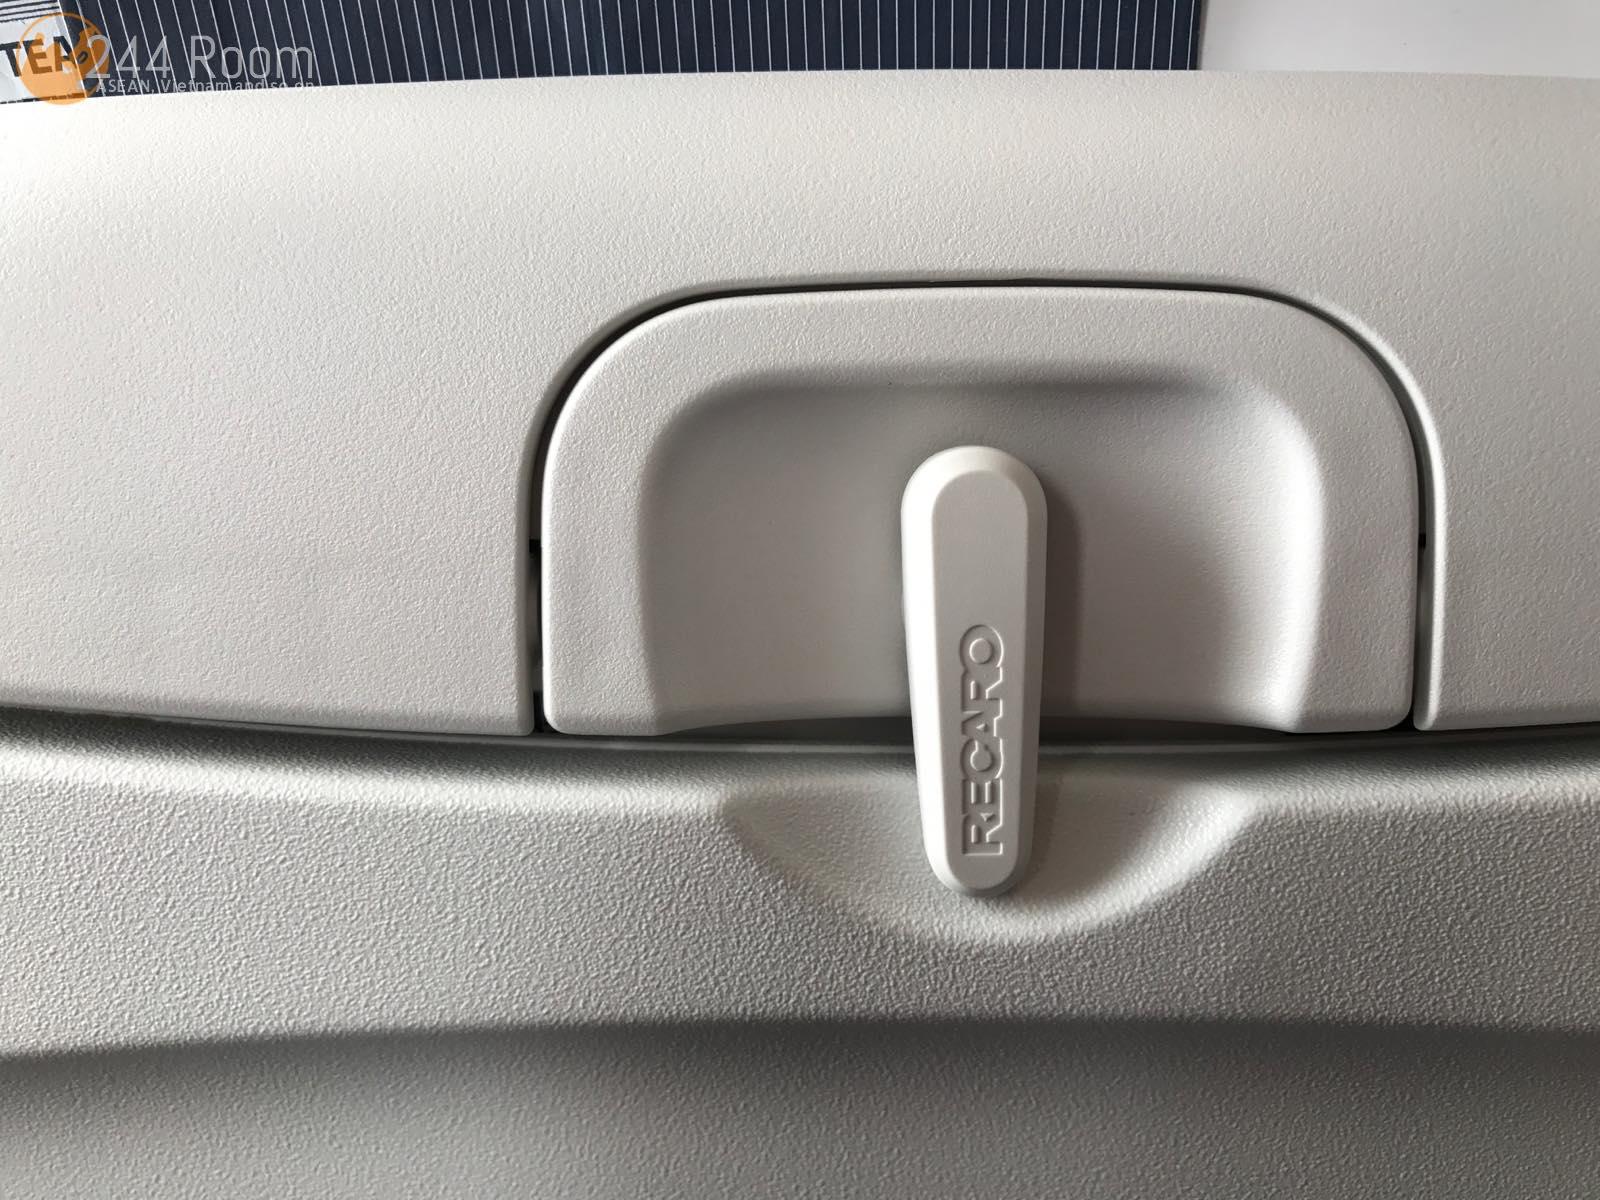 Flight ANA573-A321座席 Seat2